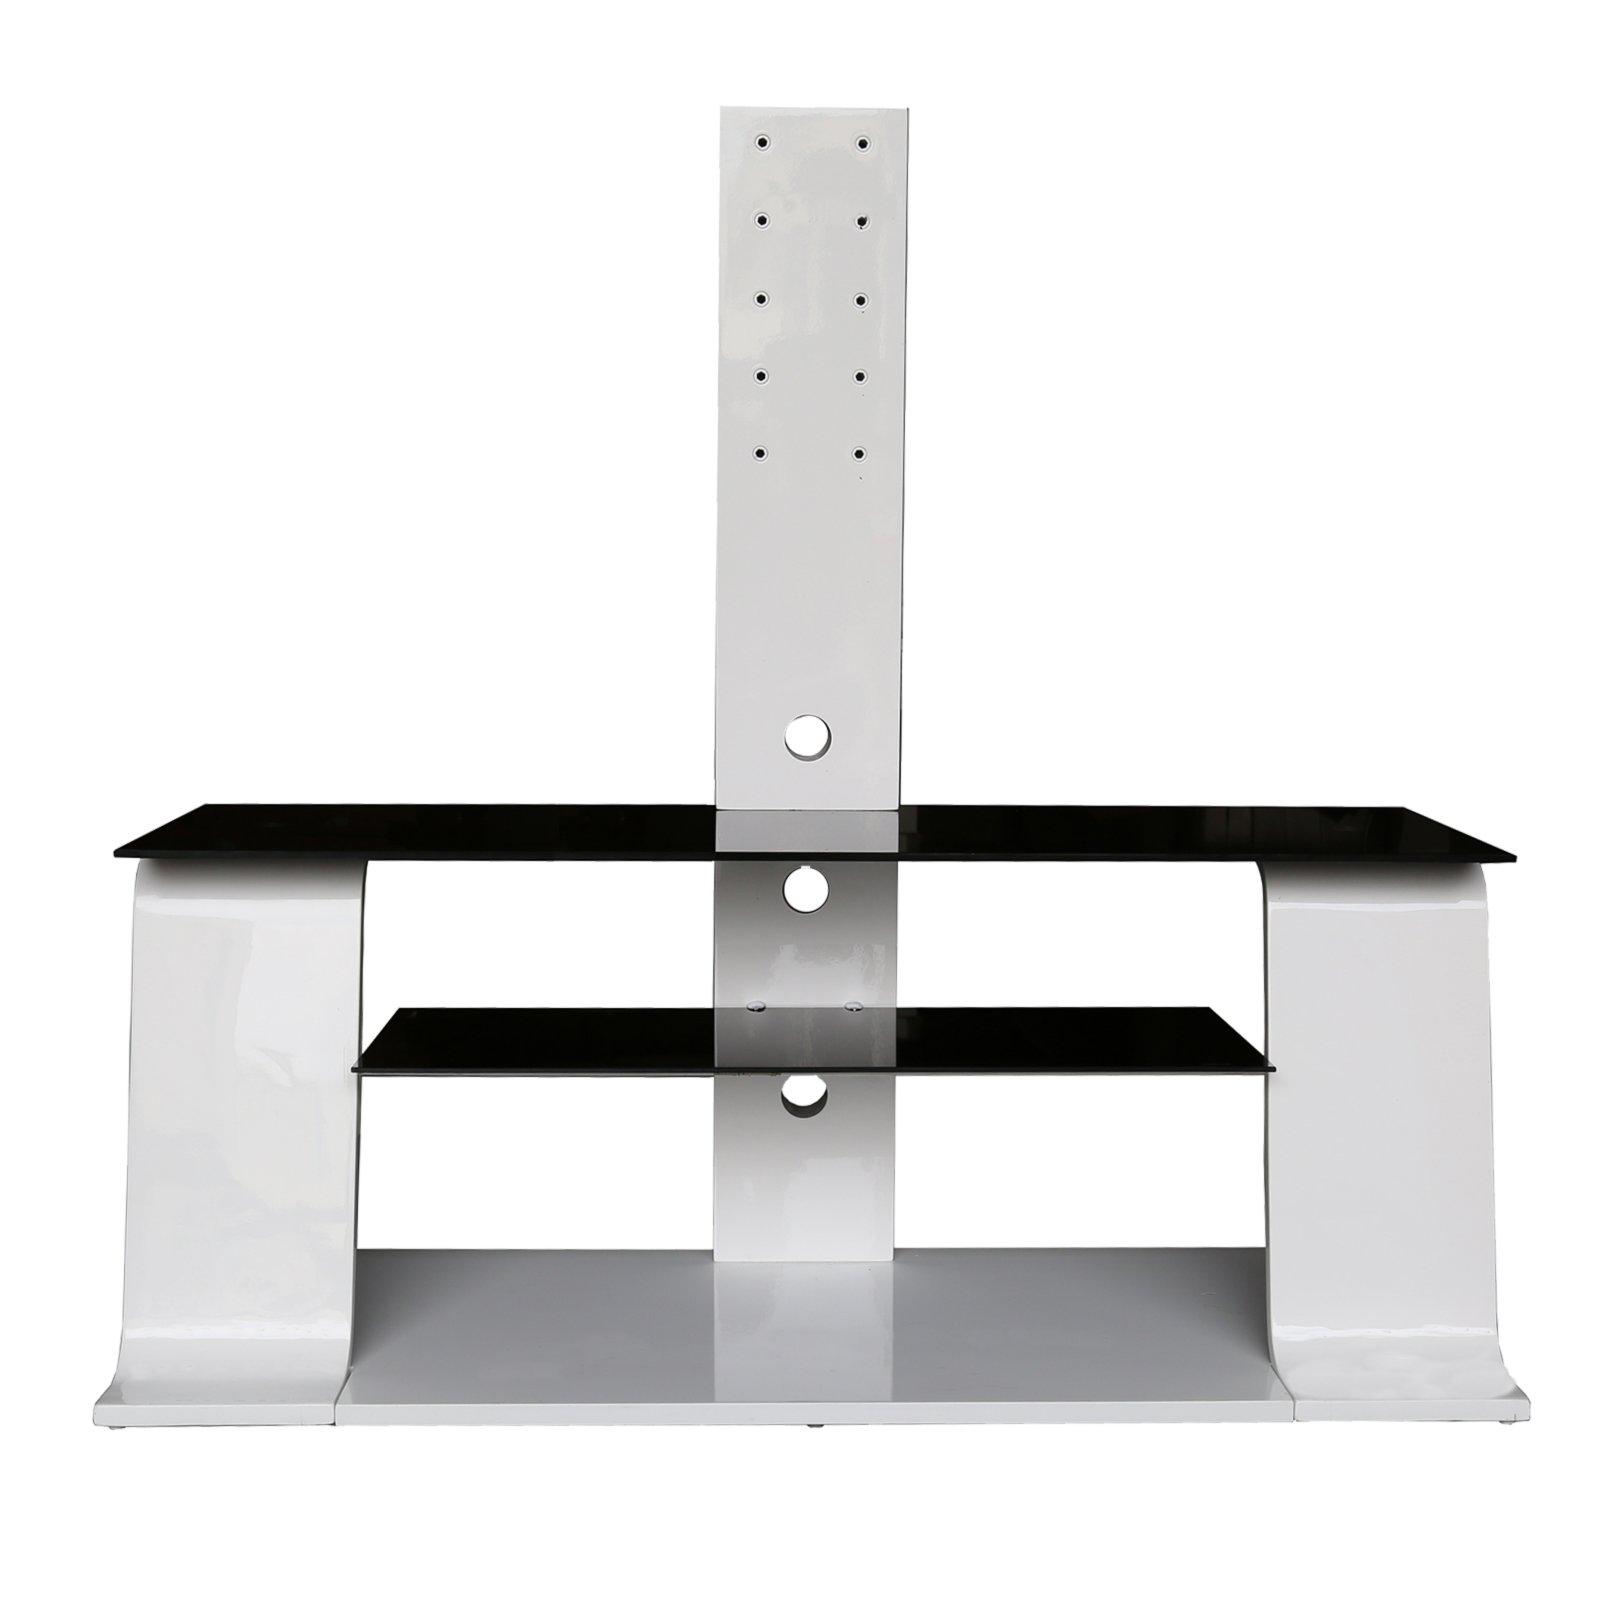 tv regal schwarz tv regal schwarz metall hochglanz neuwertig with tv regal schwarz simple tv. Black Bedroom Furniture Sets. Home Design Ideas